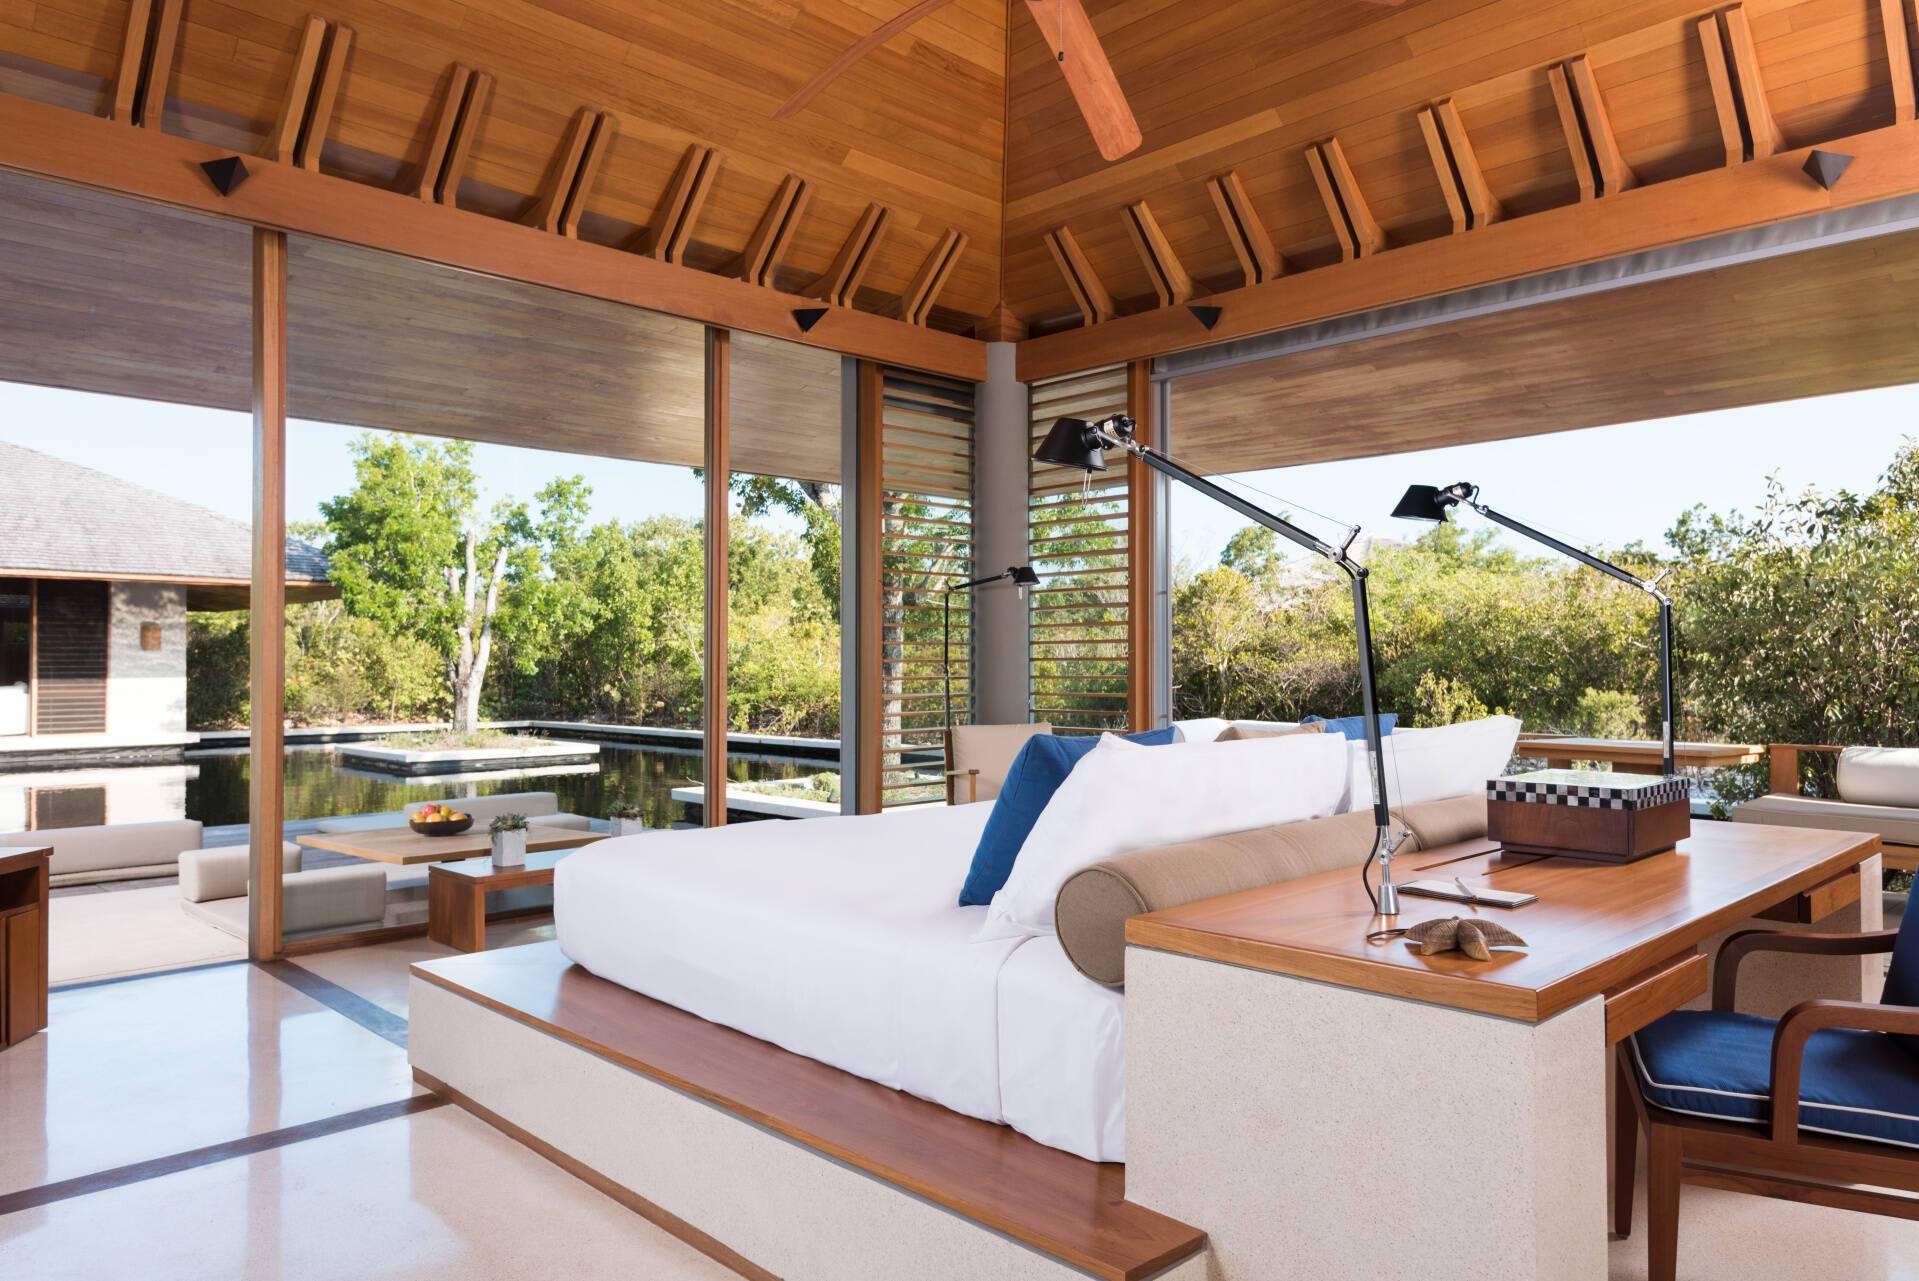 Amanyara Tranquility Villa Chambre Turks et Caicos